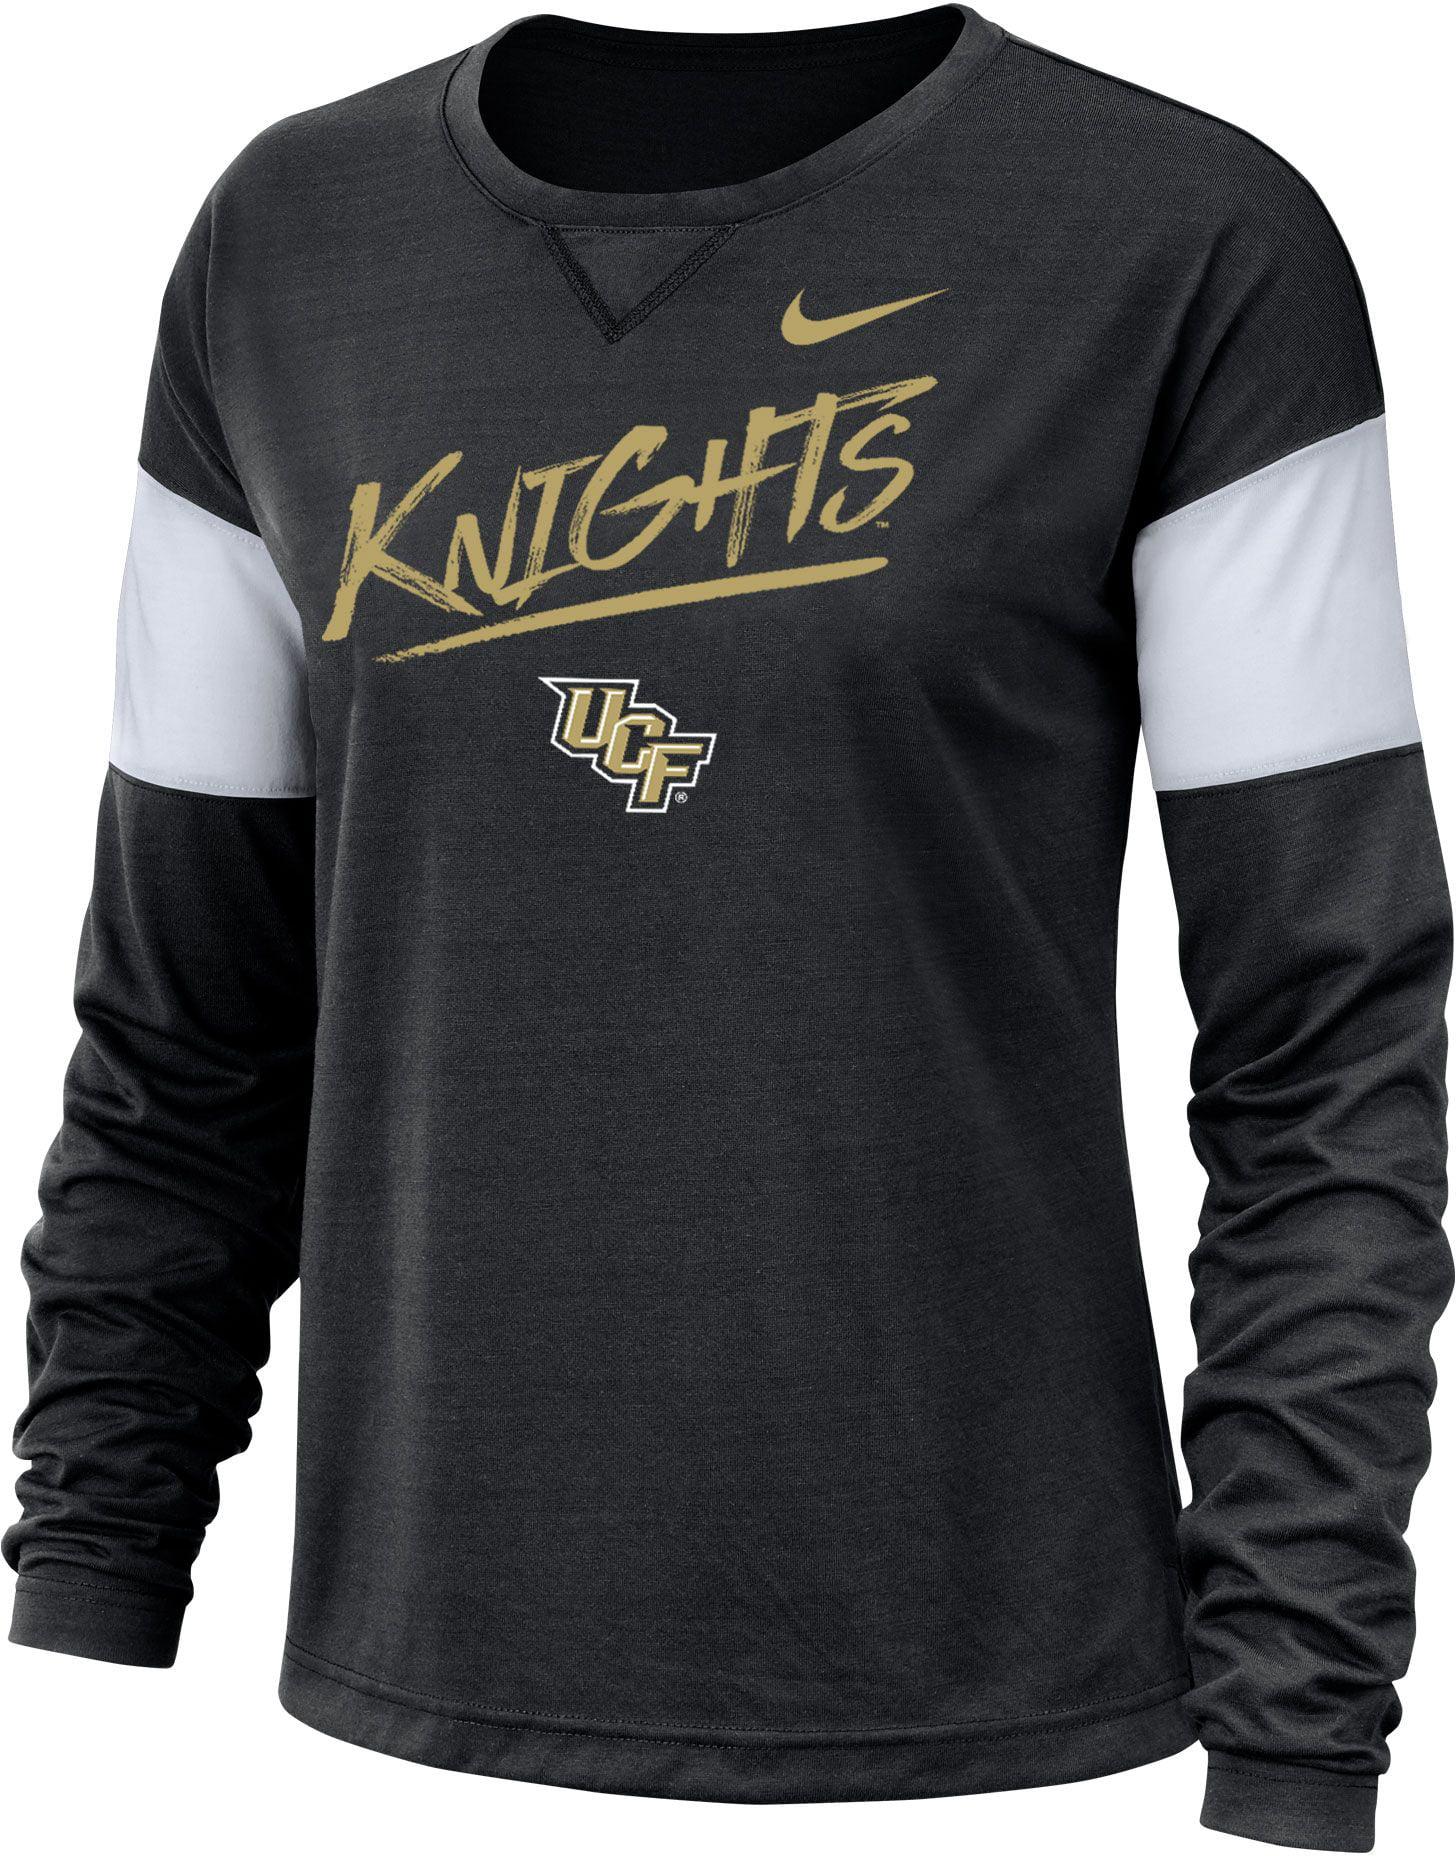 Nike - Nike Women's UCF Knights Dri-FIT